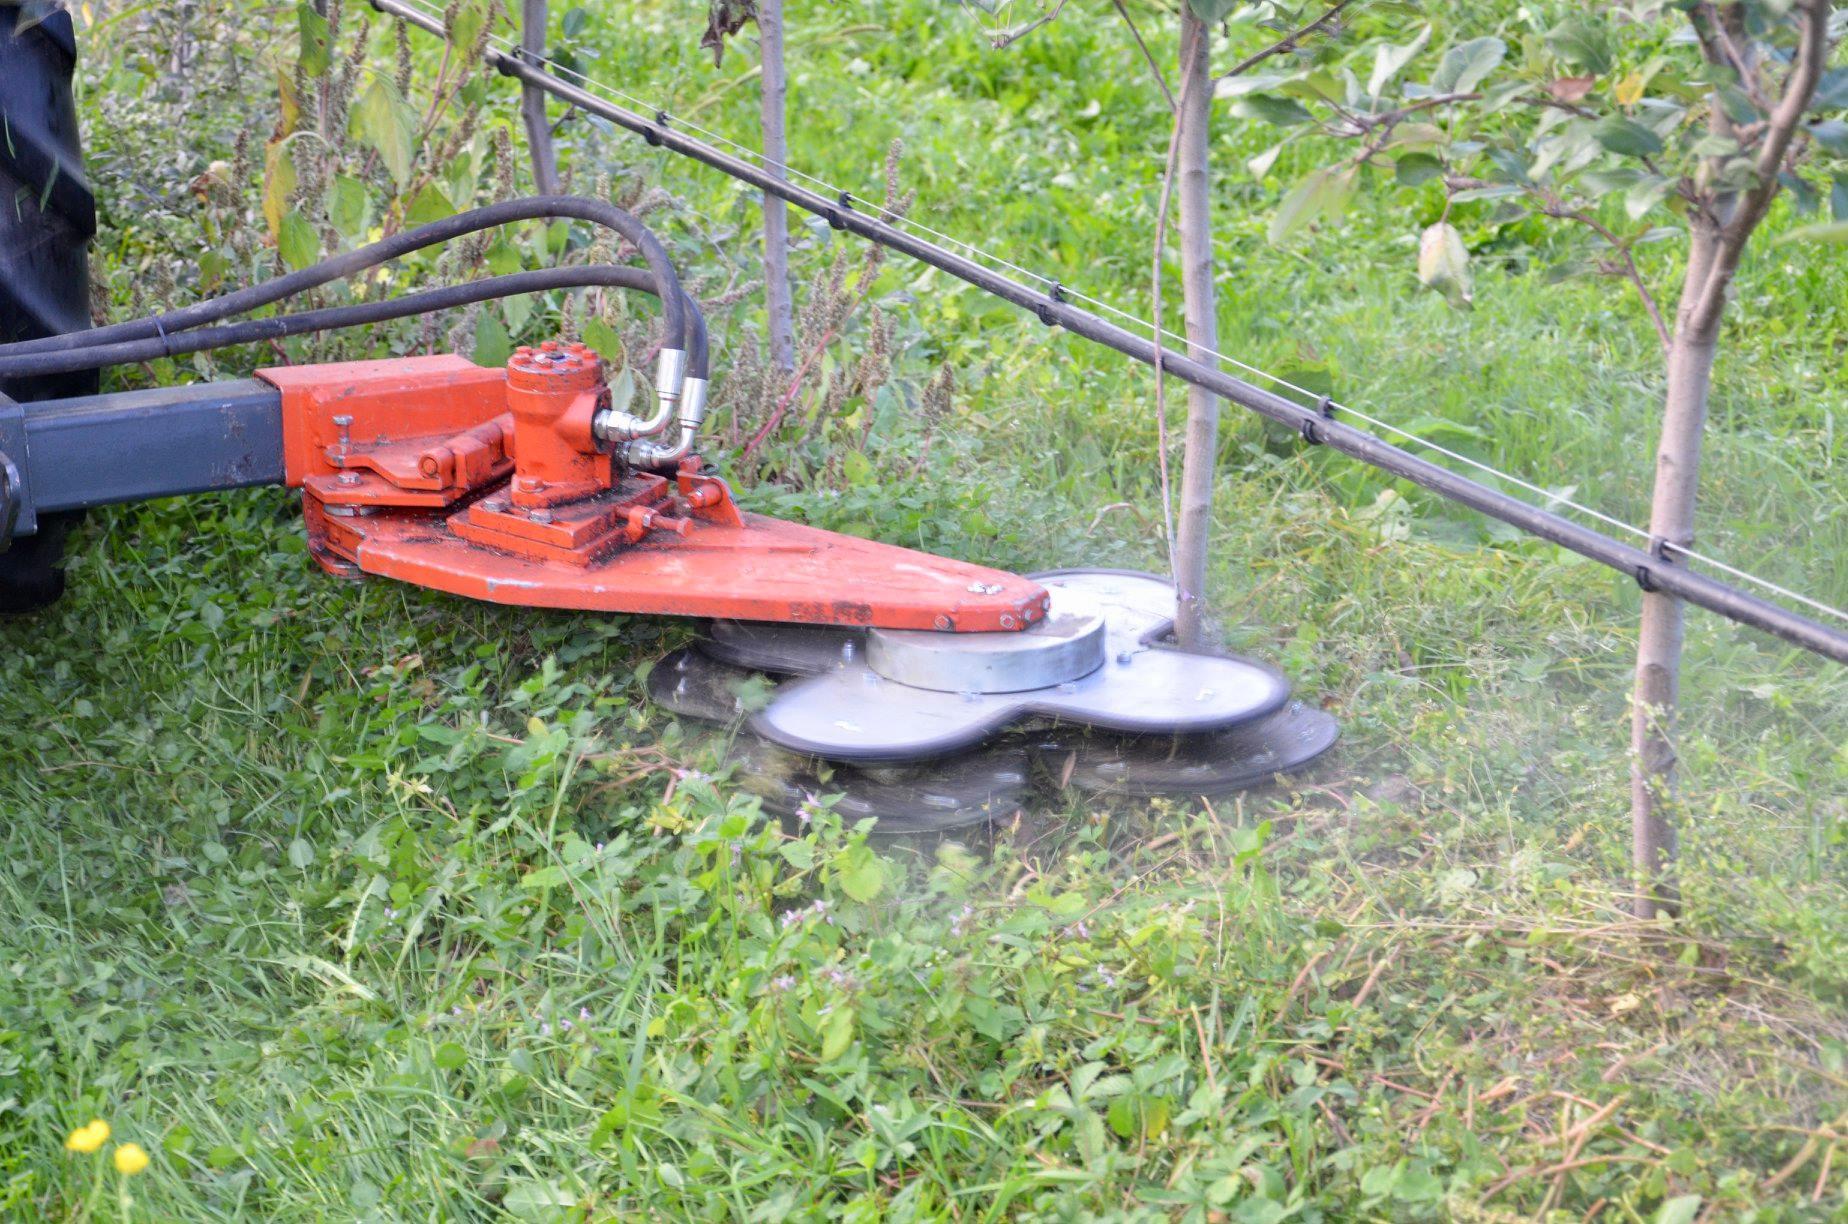 ecocut-2050-landmaschine-grasschneidemaschine-landwirtschaft